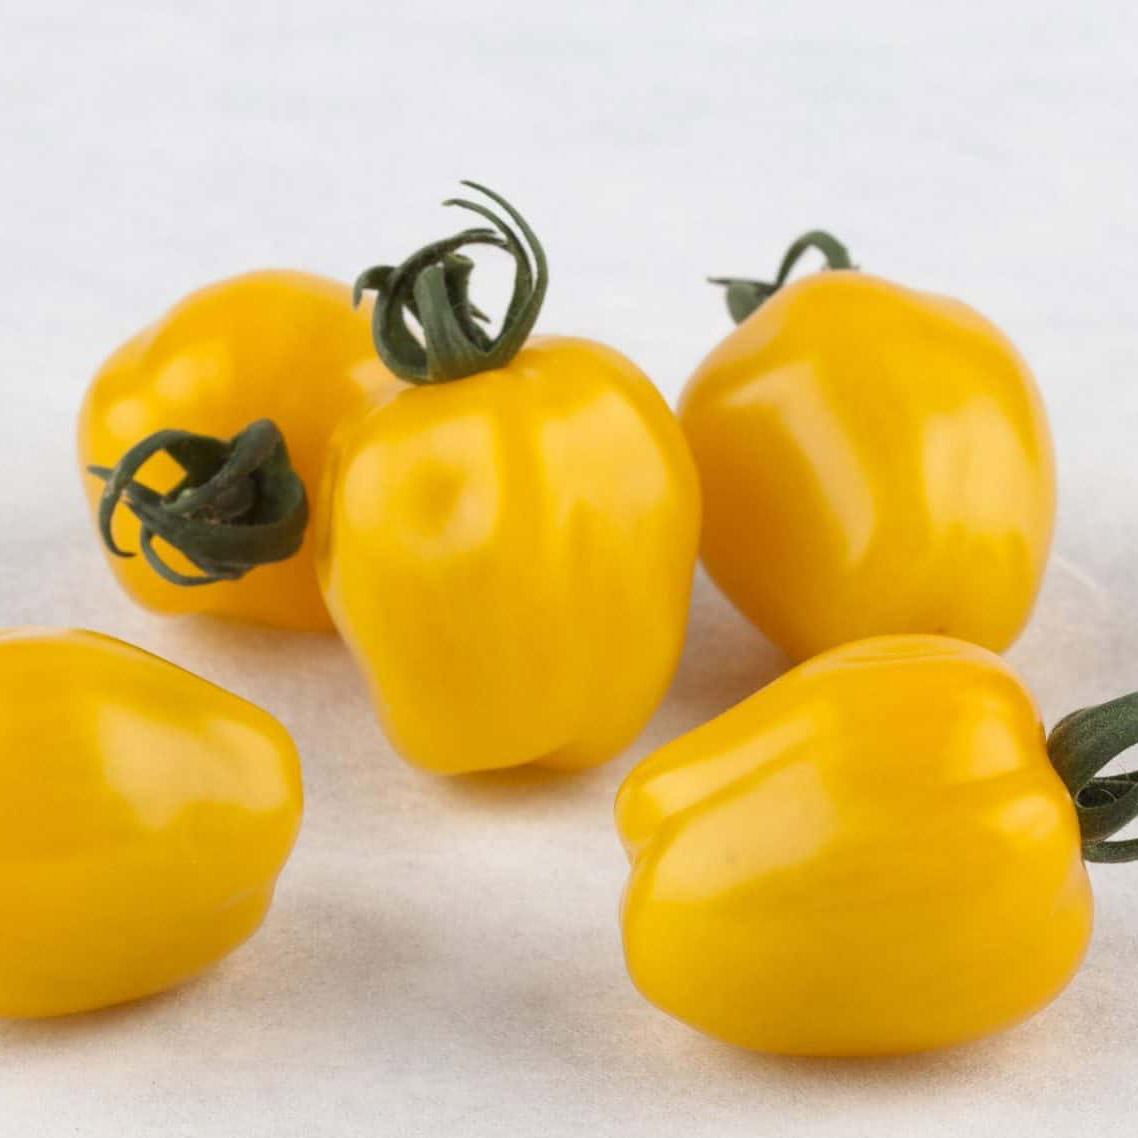 'Apple Yellow' Tomatoes